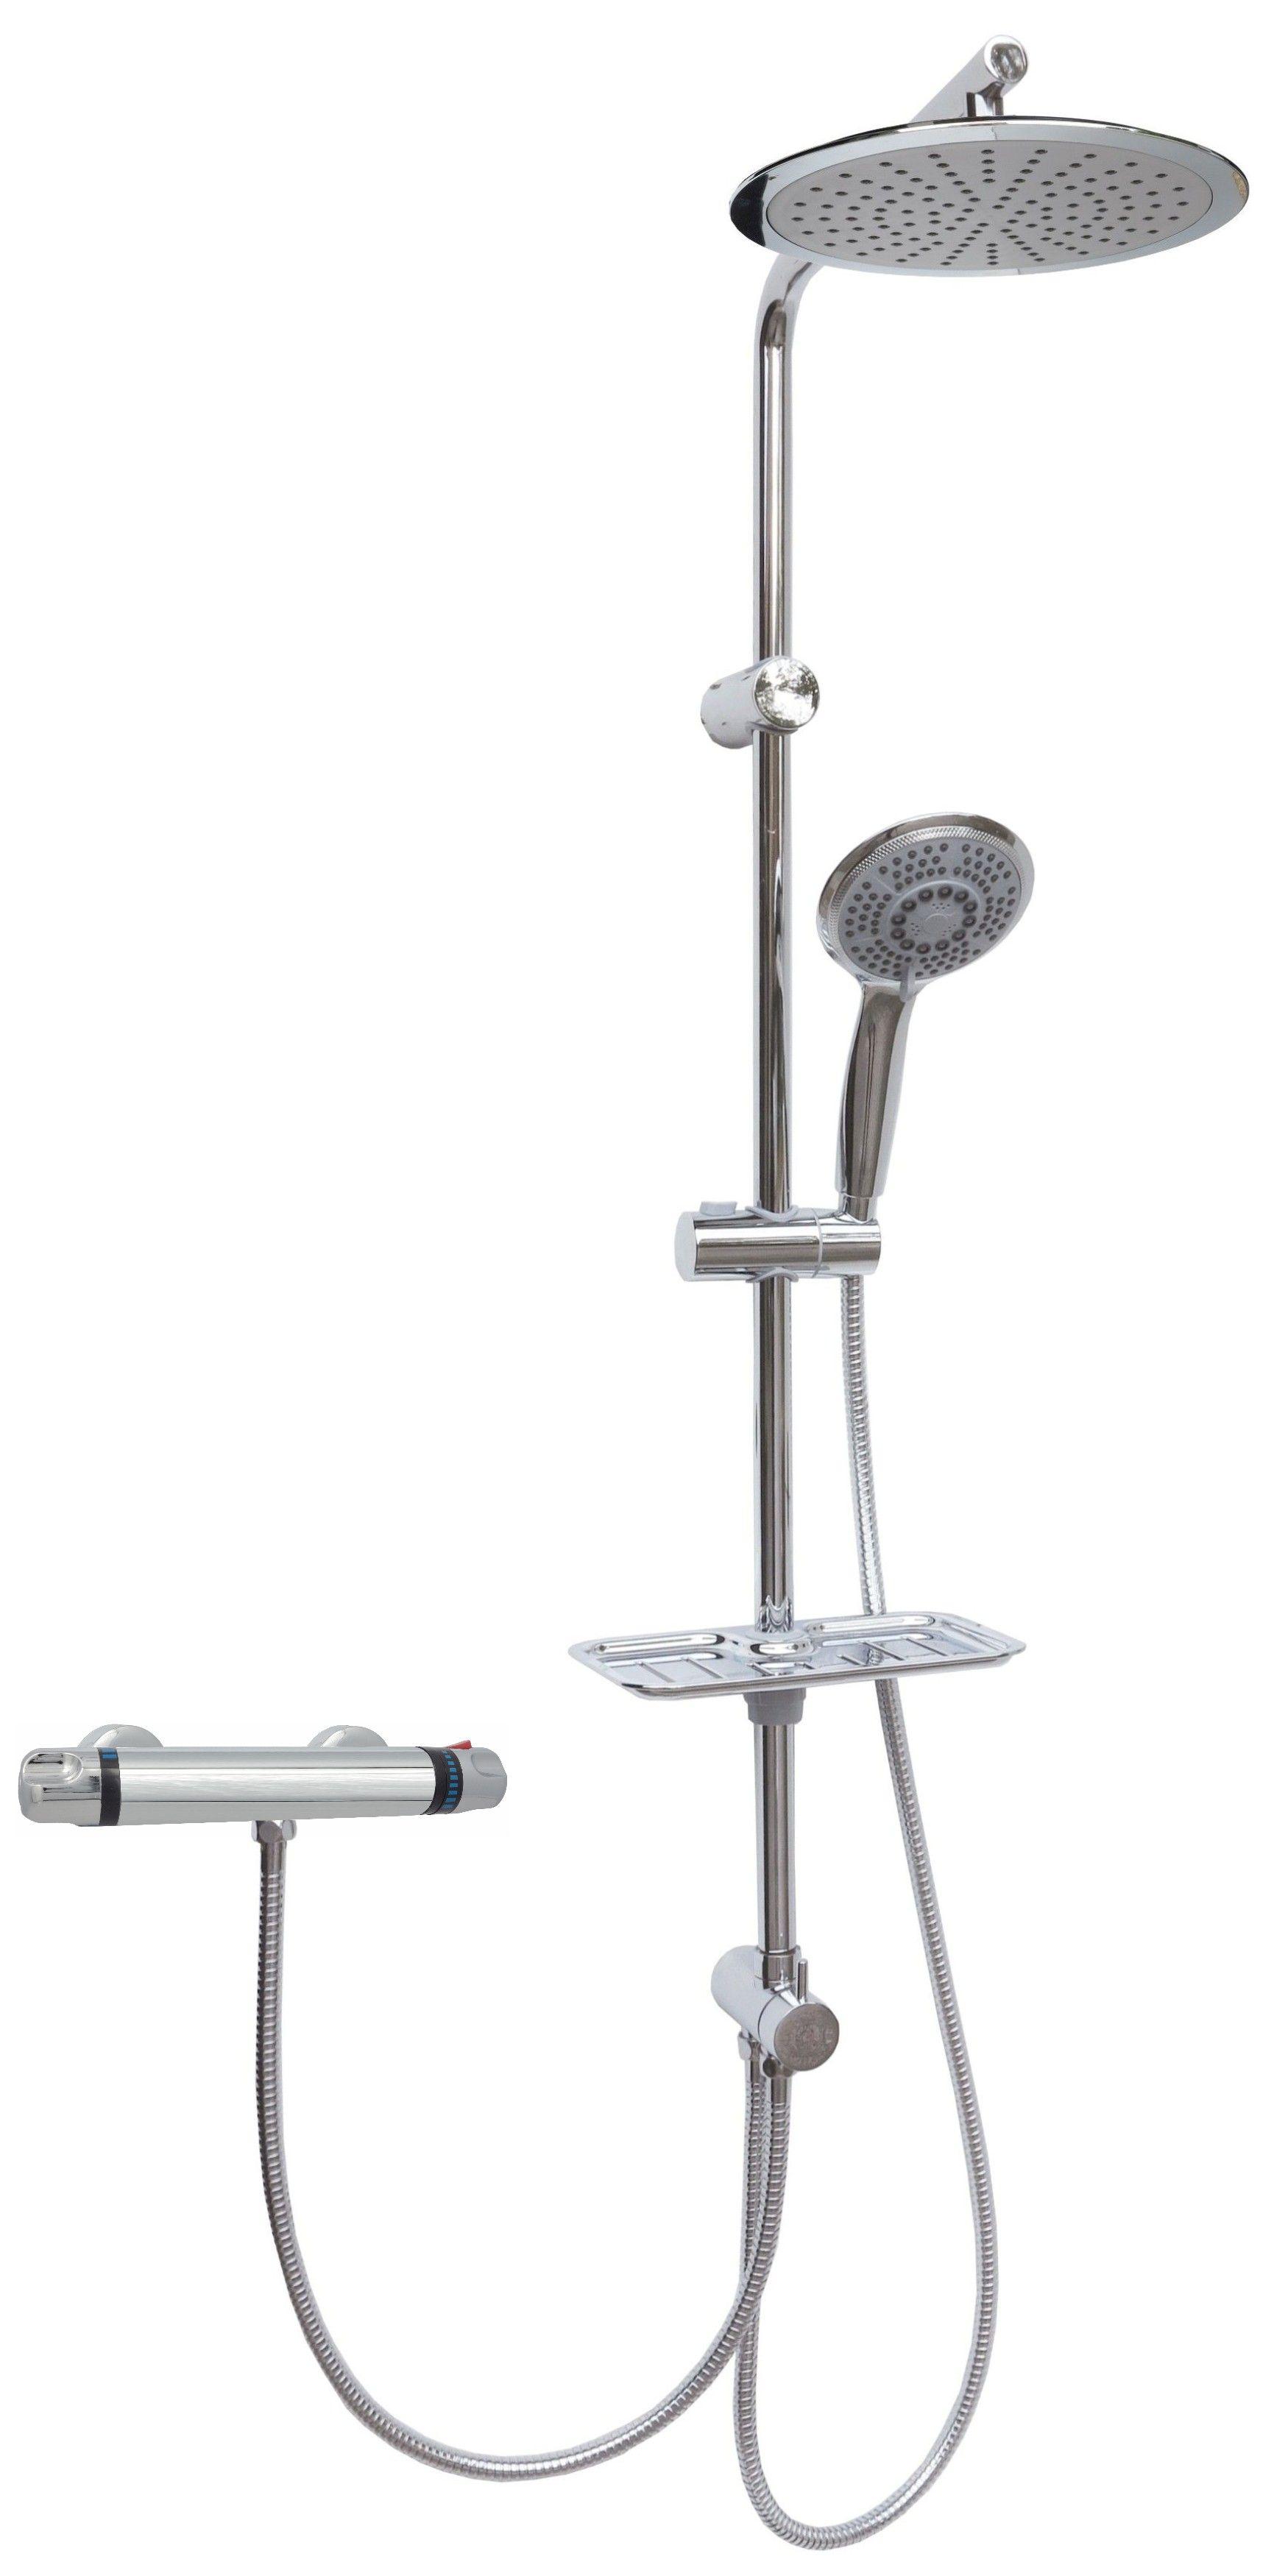 thermostat duscharmatur duschset regendusche duschsystem duschkopf handbrause ebay. Black Bedroom Furniture Sets. Home Design Ideas